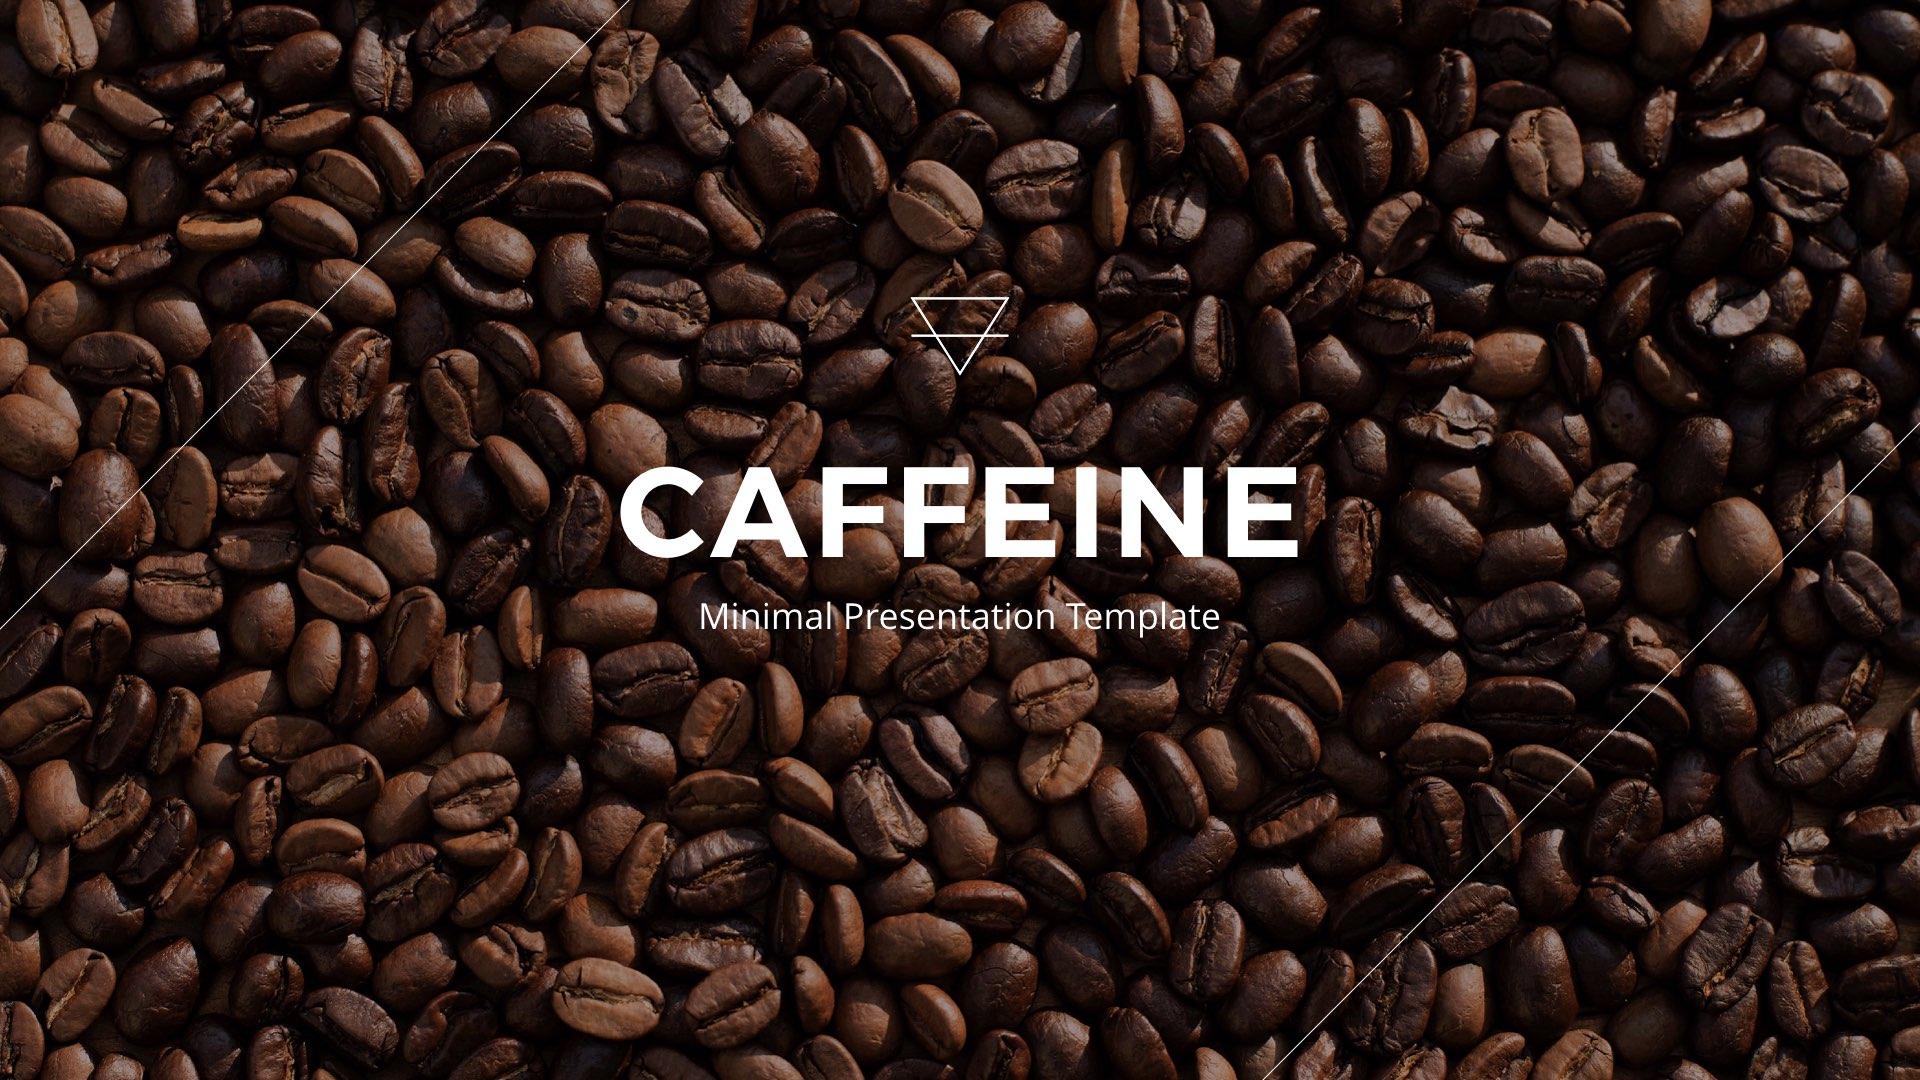 caffeine google slide presentation templatezacwhyyy | graphicriver, Coffee Presentation Template, Presentation templates